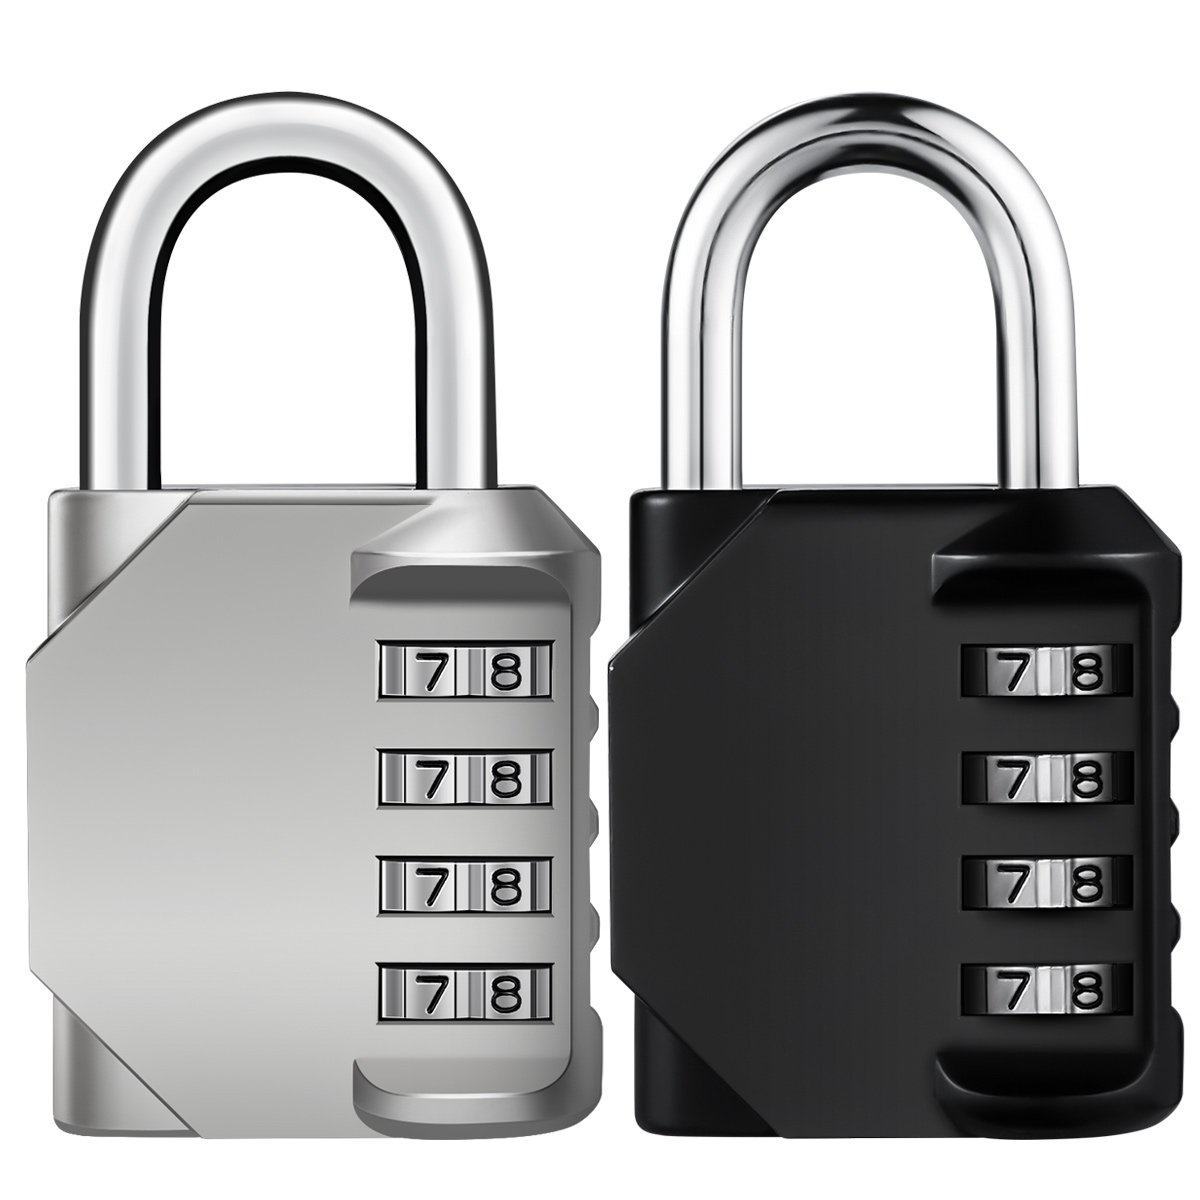 Combination Lock, KeeKit Padlock Combination, 4 Digit Re-settable Combo Lock, Gym Lock, Locker Lock, Waterproof Outdoor Combination Lock for Gate, Cases, Toolbox, Silver&Black, 2 Pack